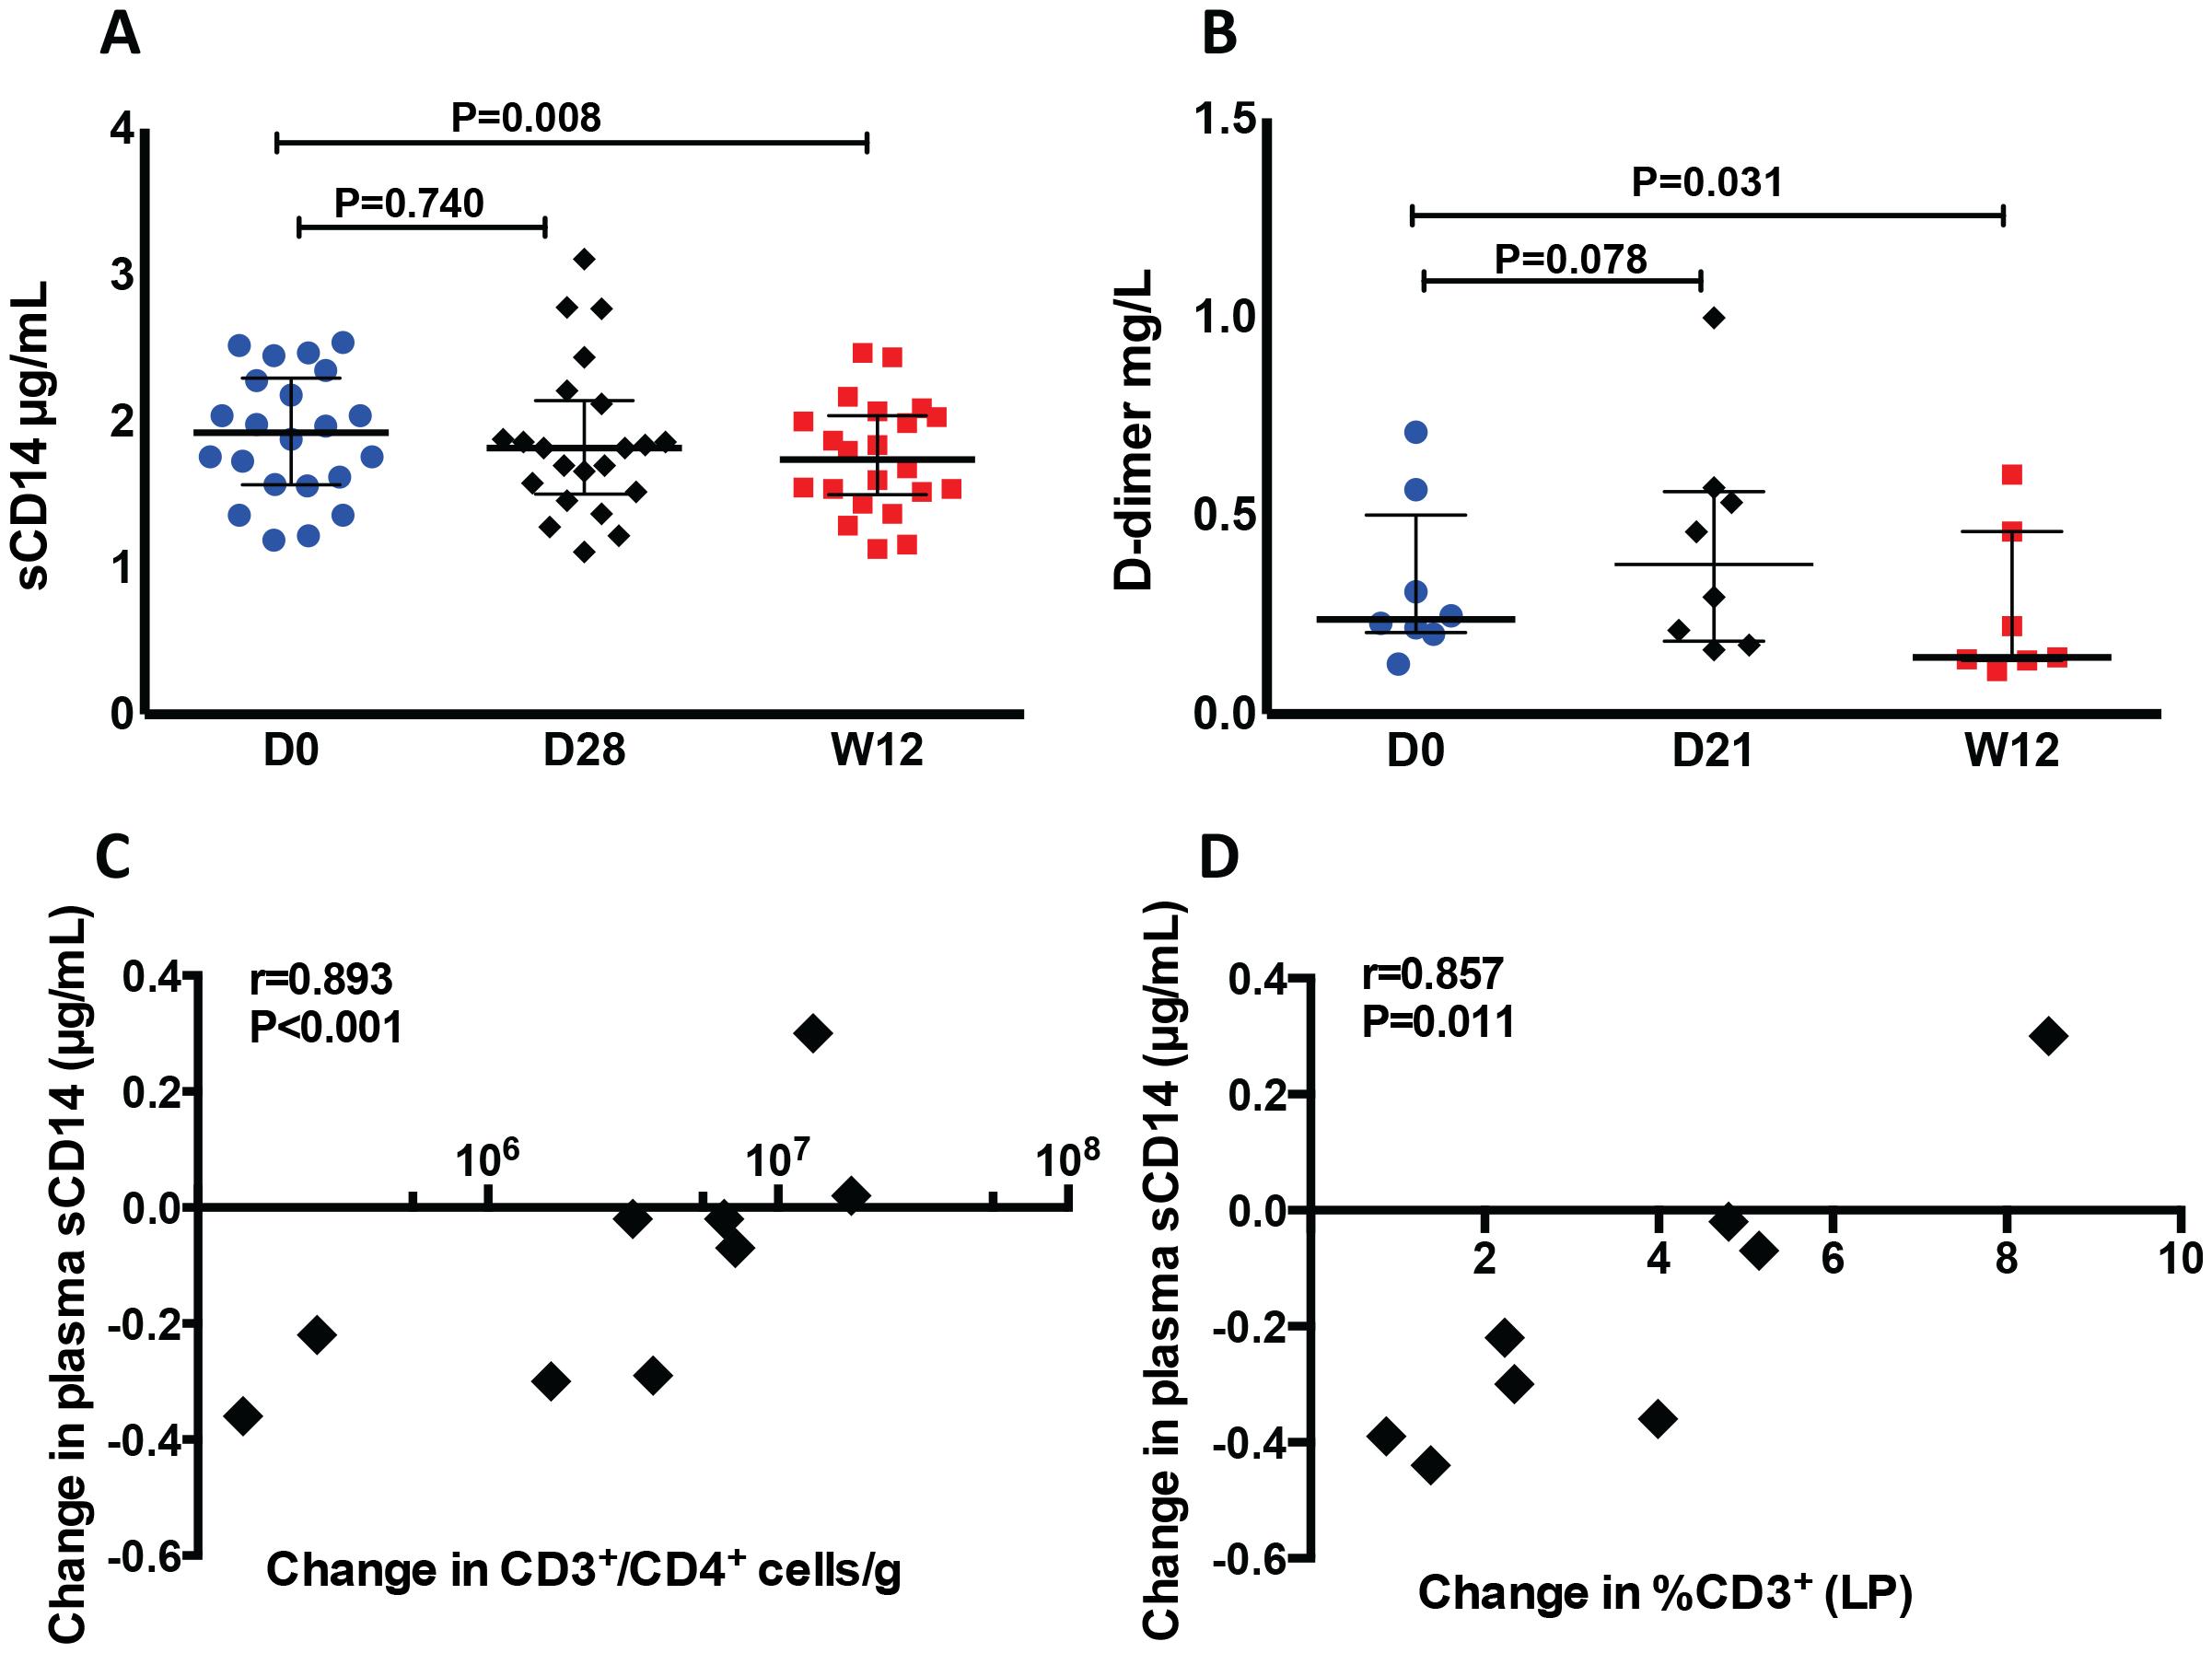 Decreased plasma levels of sCD14 and D-dimer after r-hIL-7 administration.